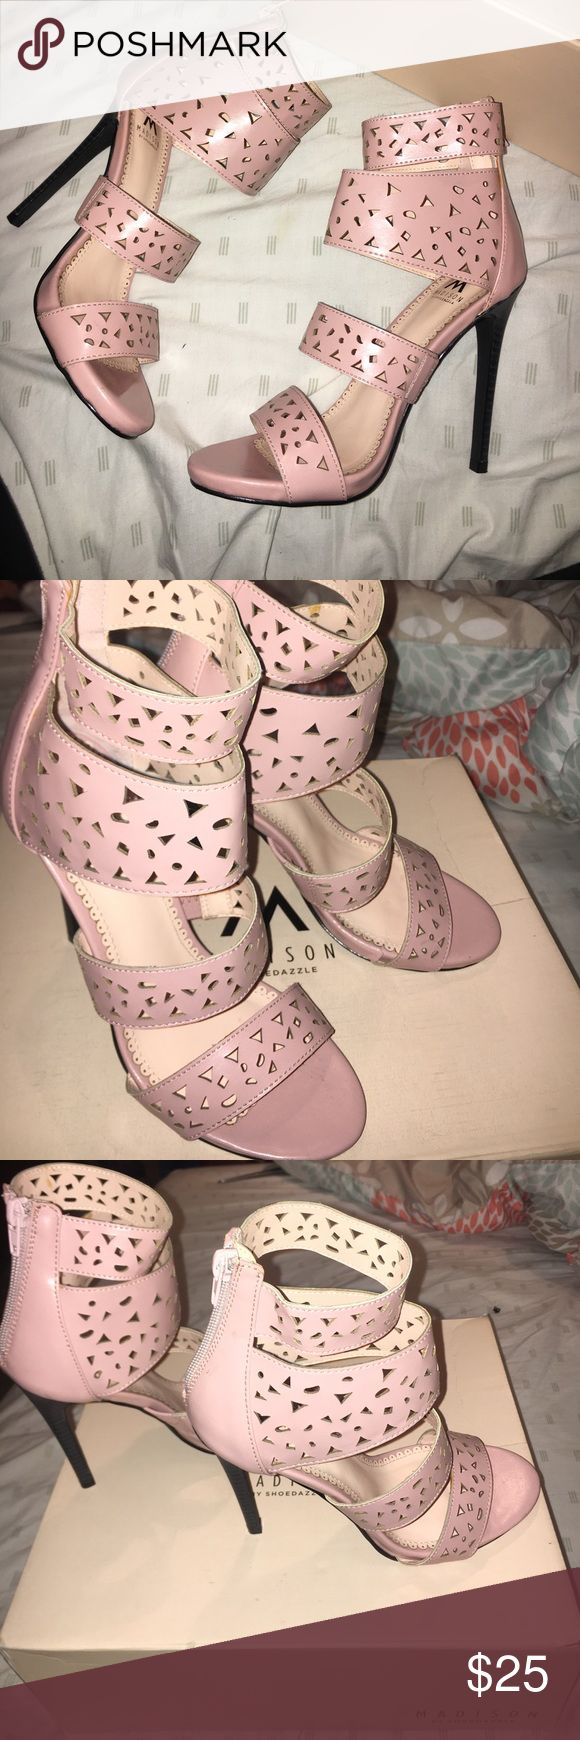 Shoe dazzle heels size 6.5 Cute light pink pumps, never worn still in box. Shoe Dazzle Shoes Heels